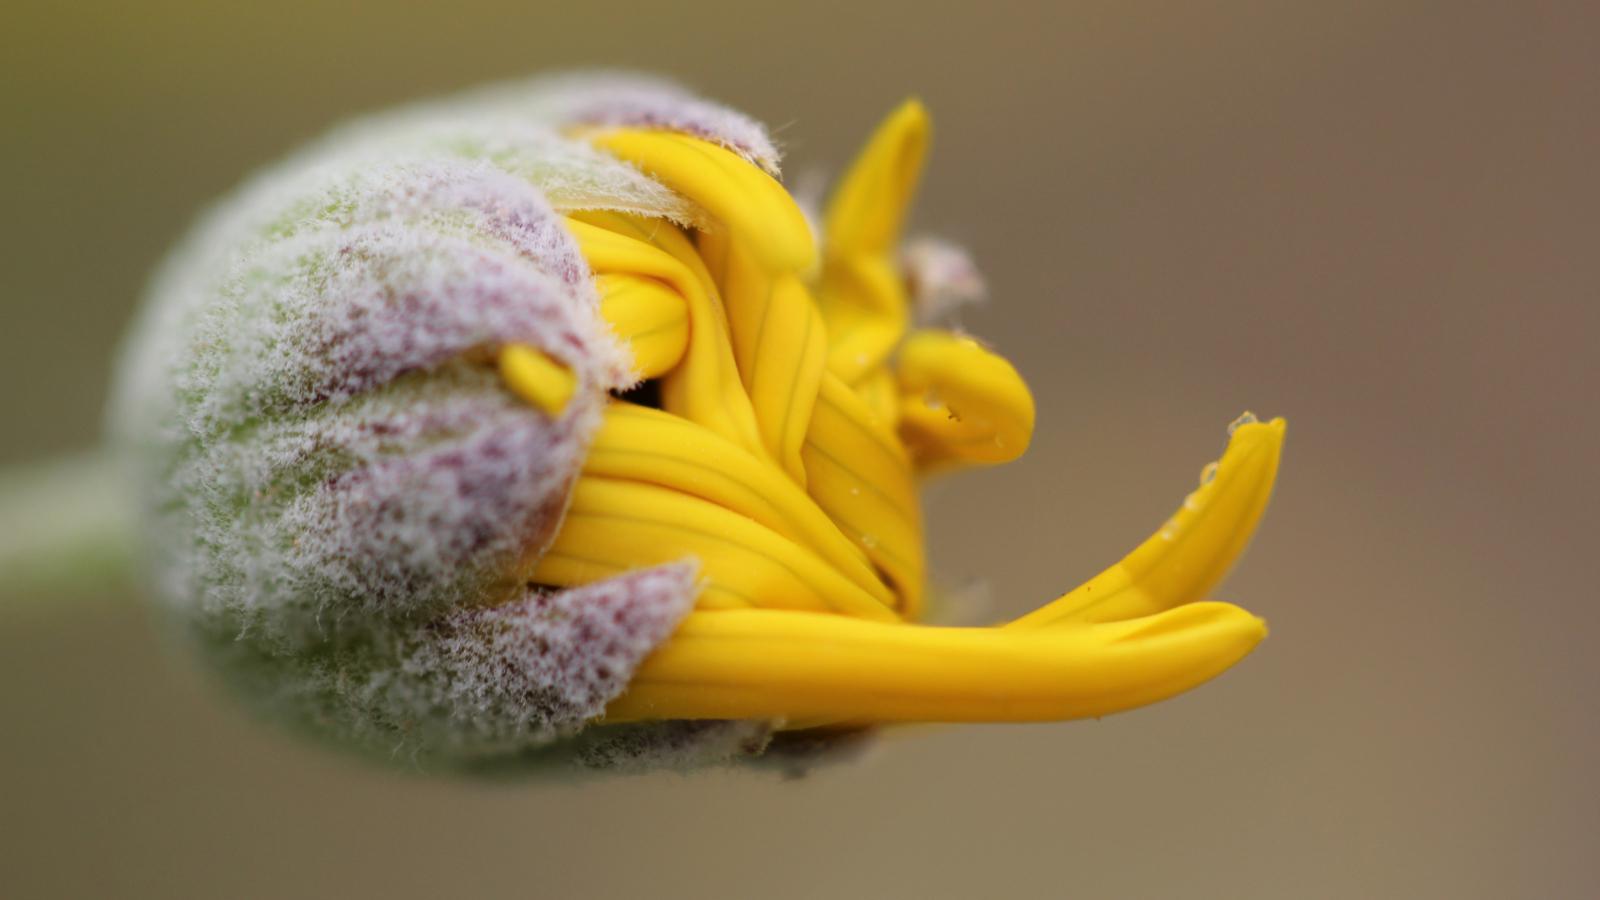 1600x900 wallpaper Yellow flower bud, close up